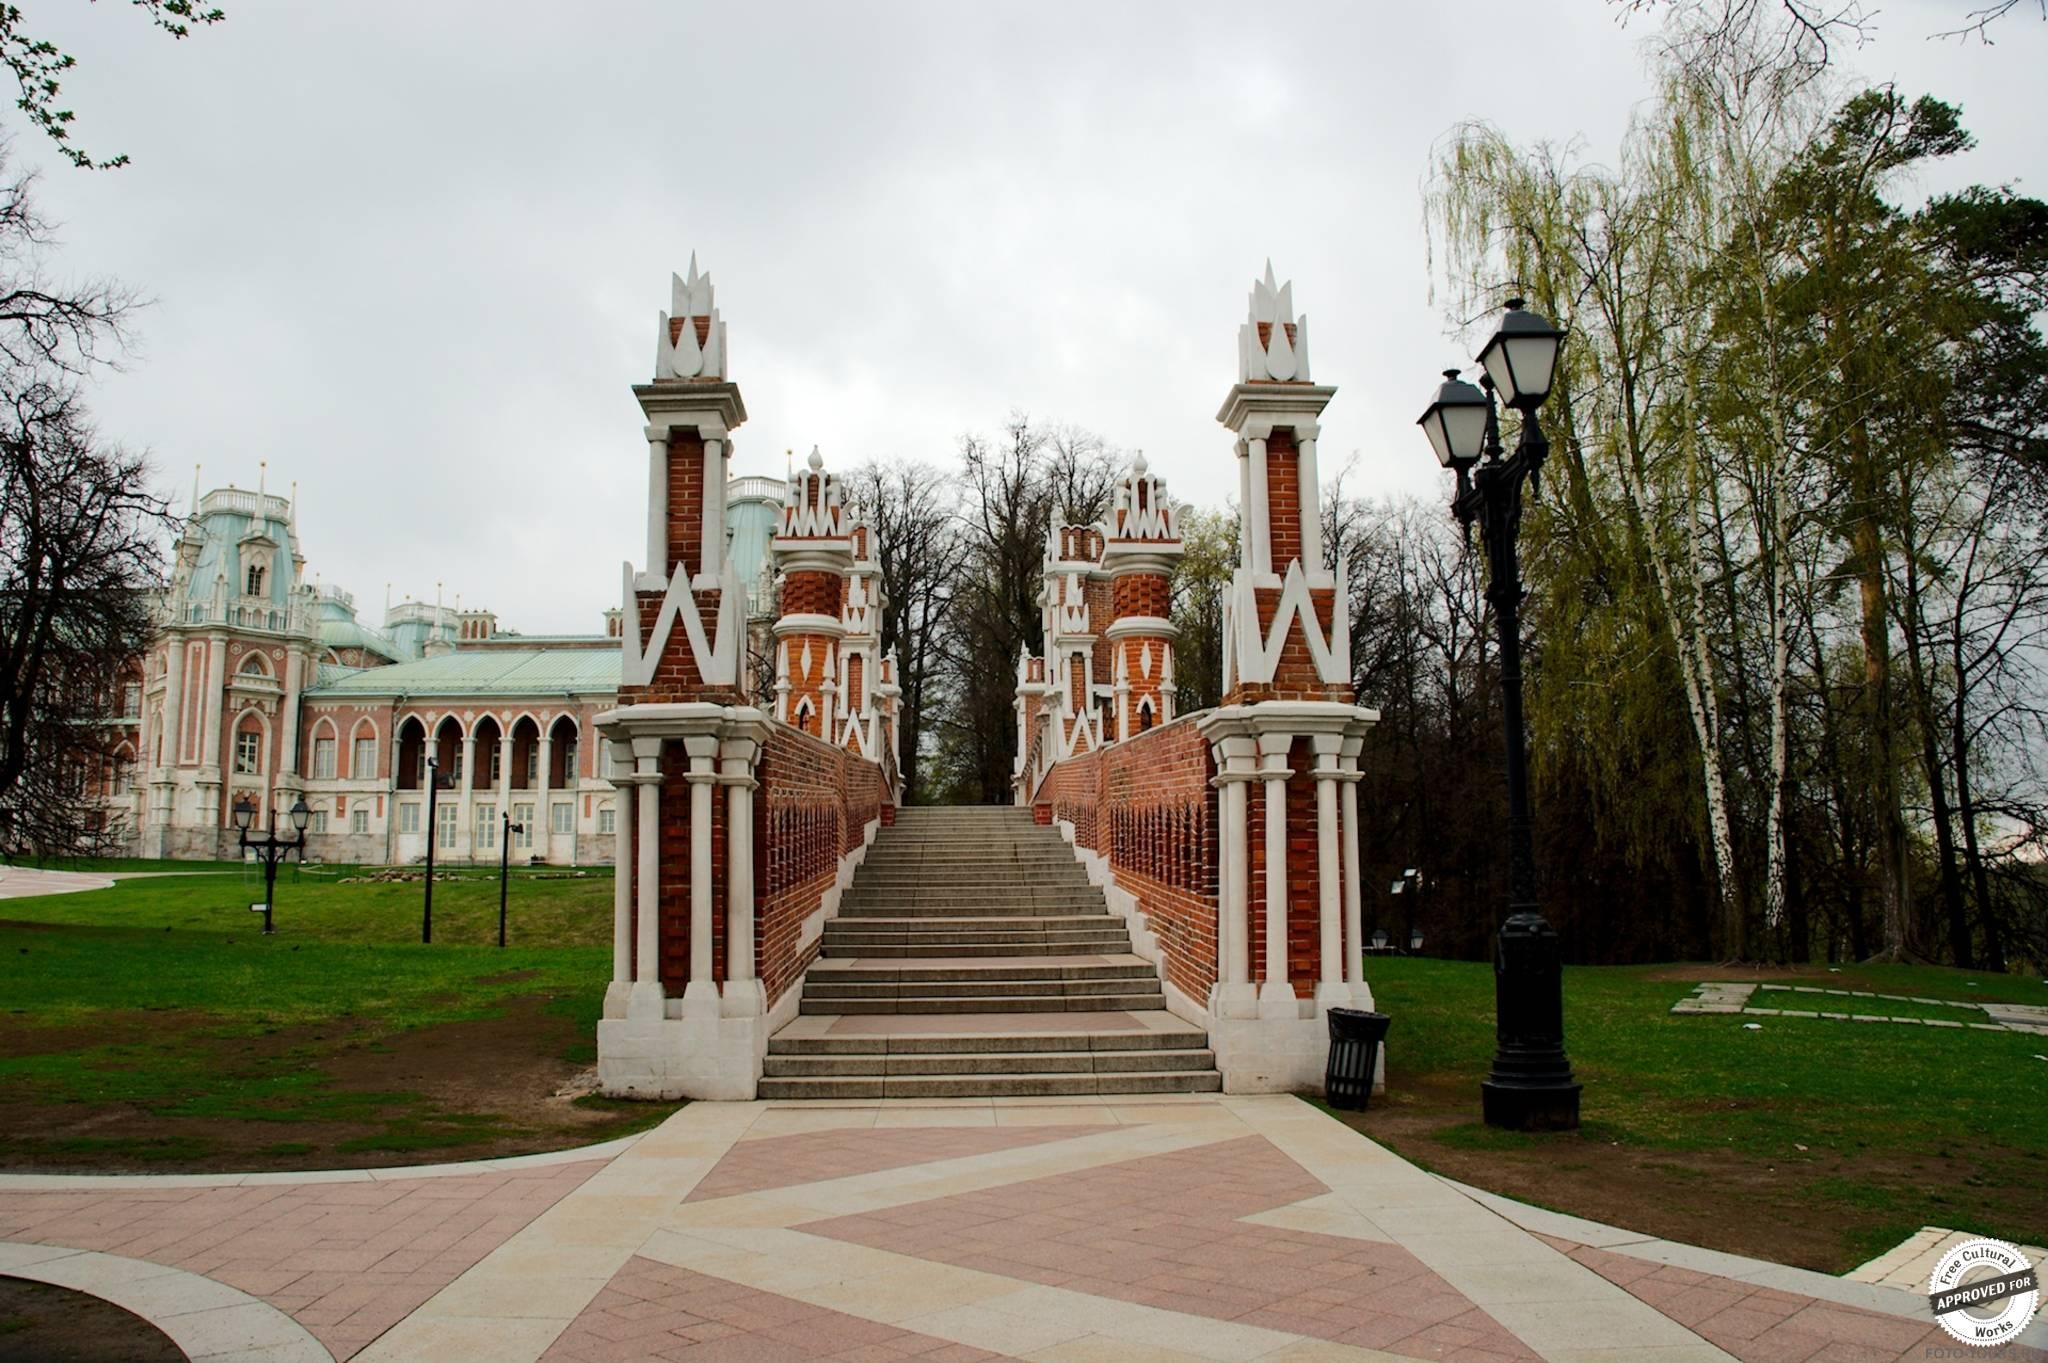 Фигурный мост, Царицыно, Парки москвы.